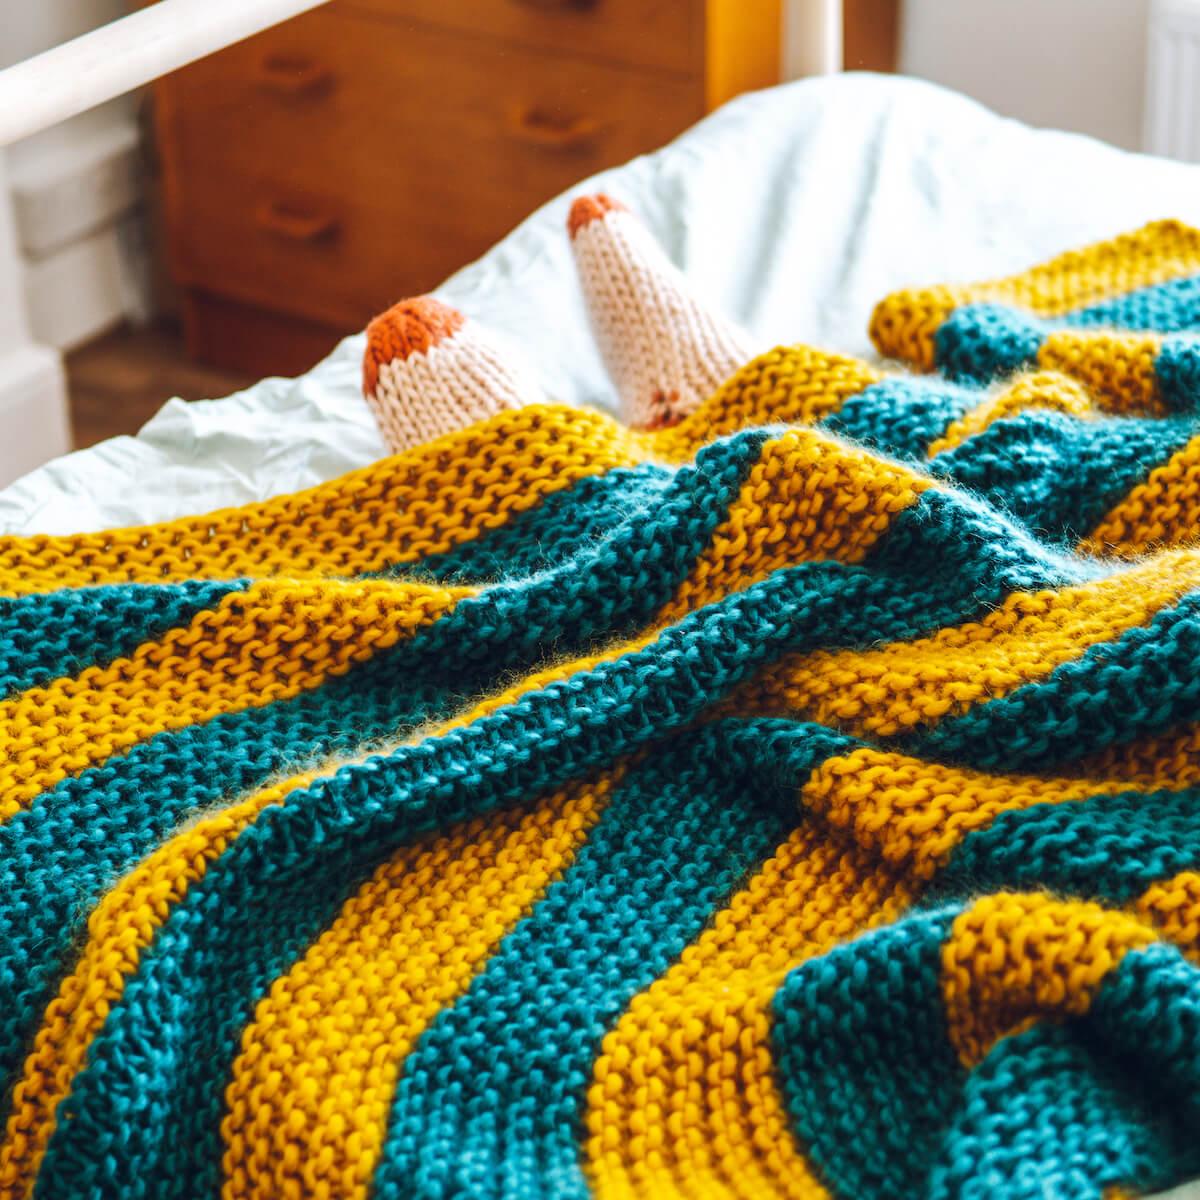 Beginners Blanket Knitting Pattern - Lauren Aston Designs